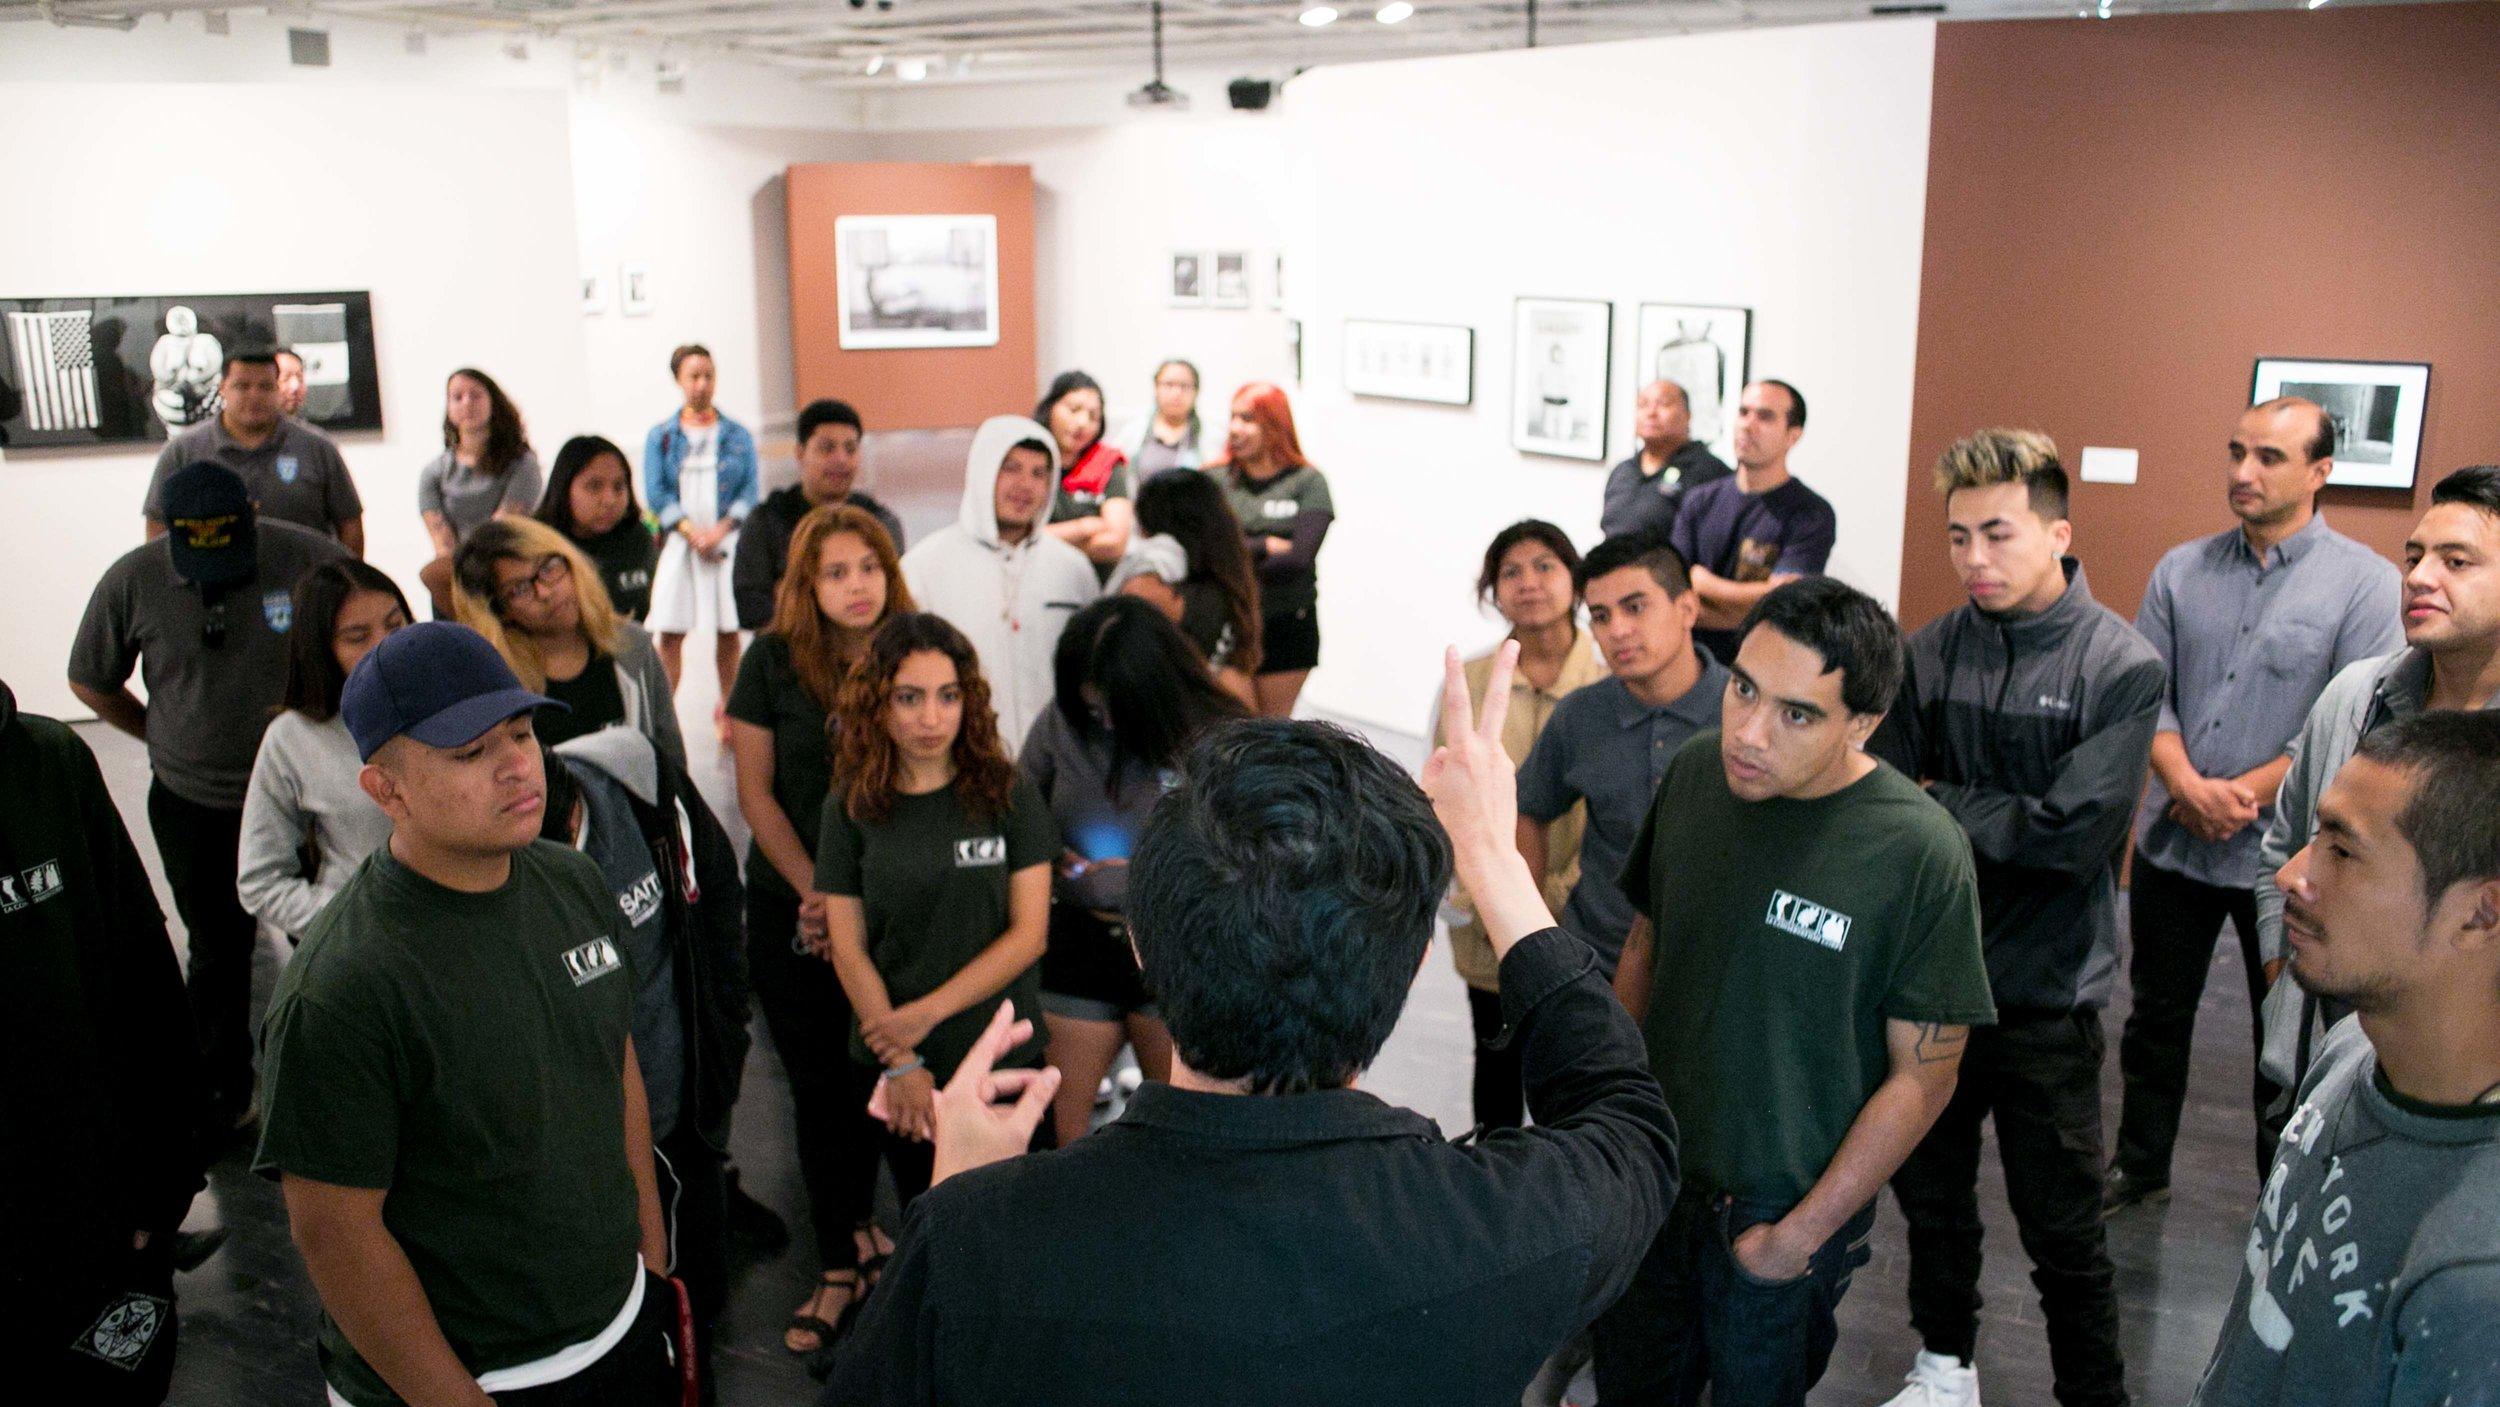 artworxLA - LA Education Crop - PP VP Museum 2017 -2440.jpg